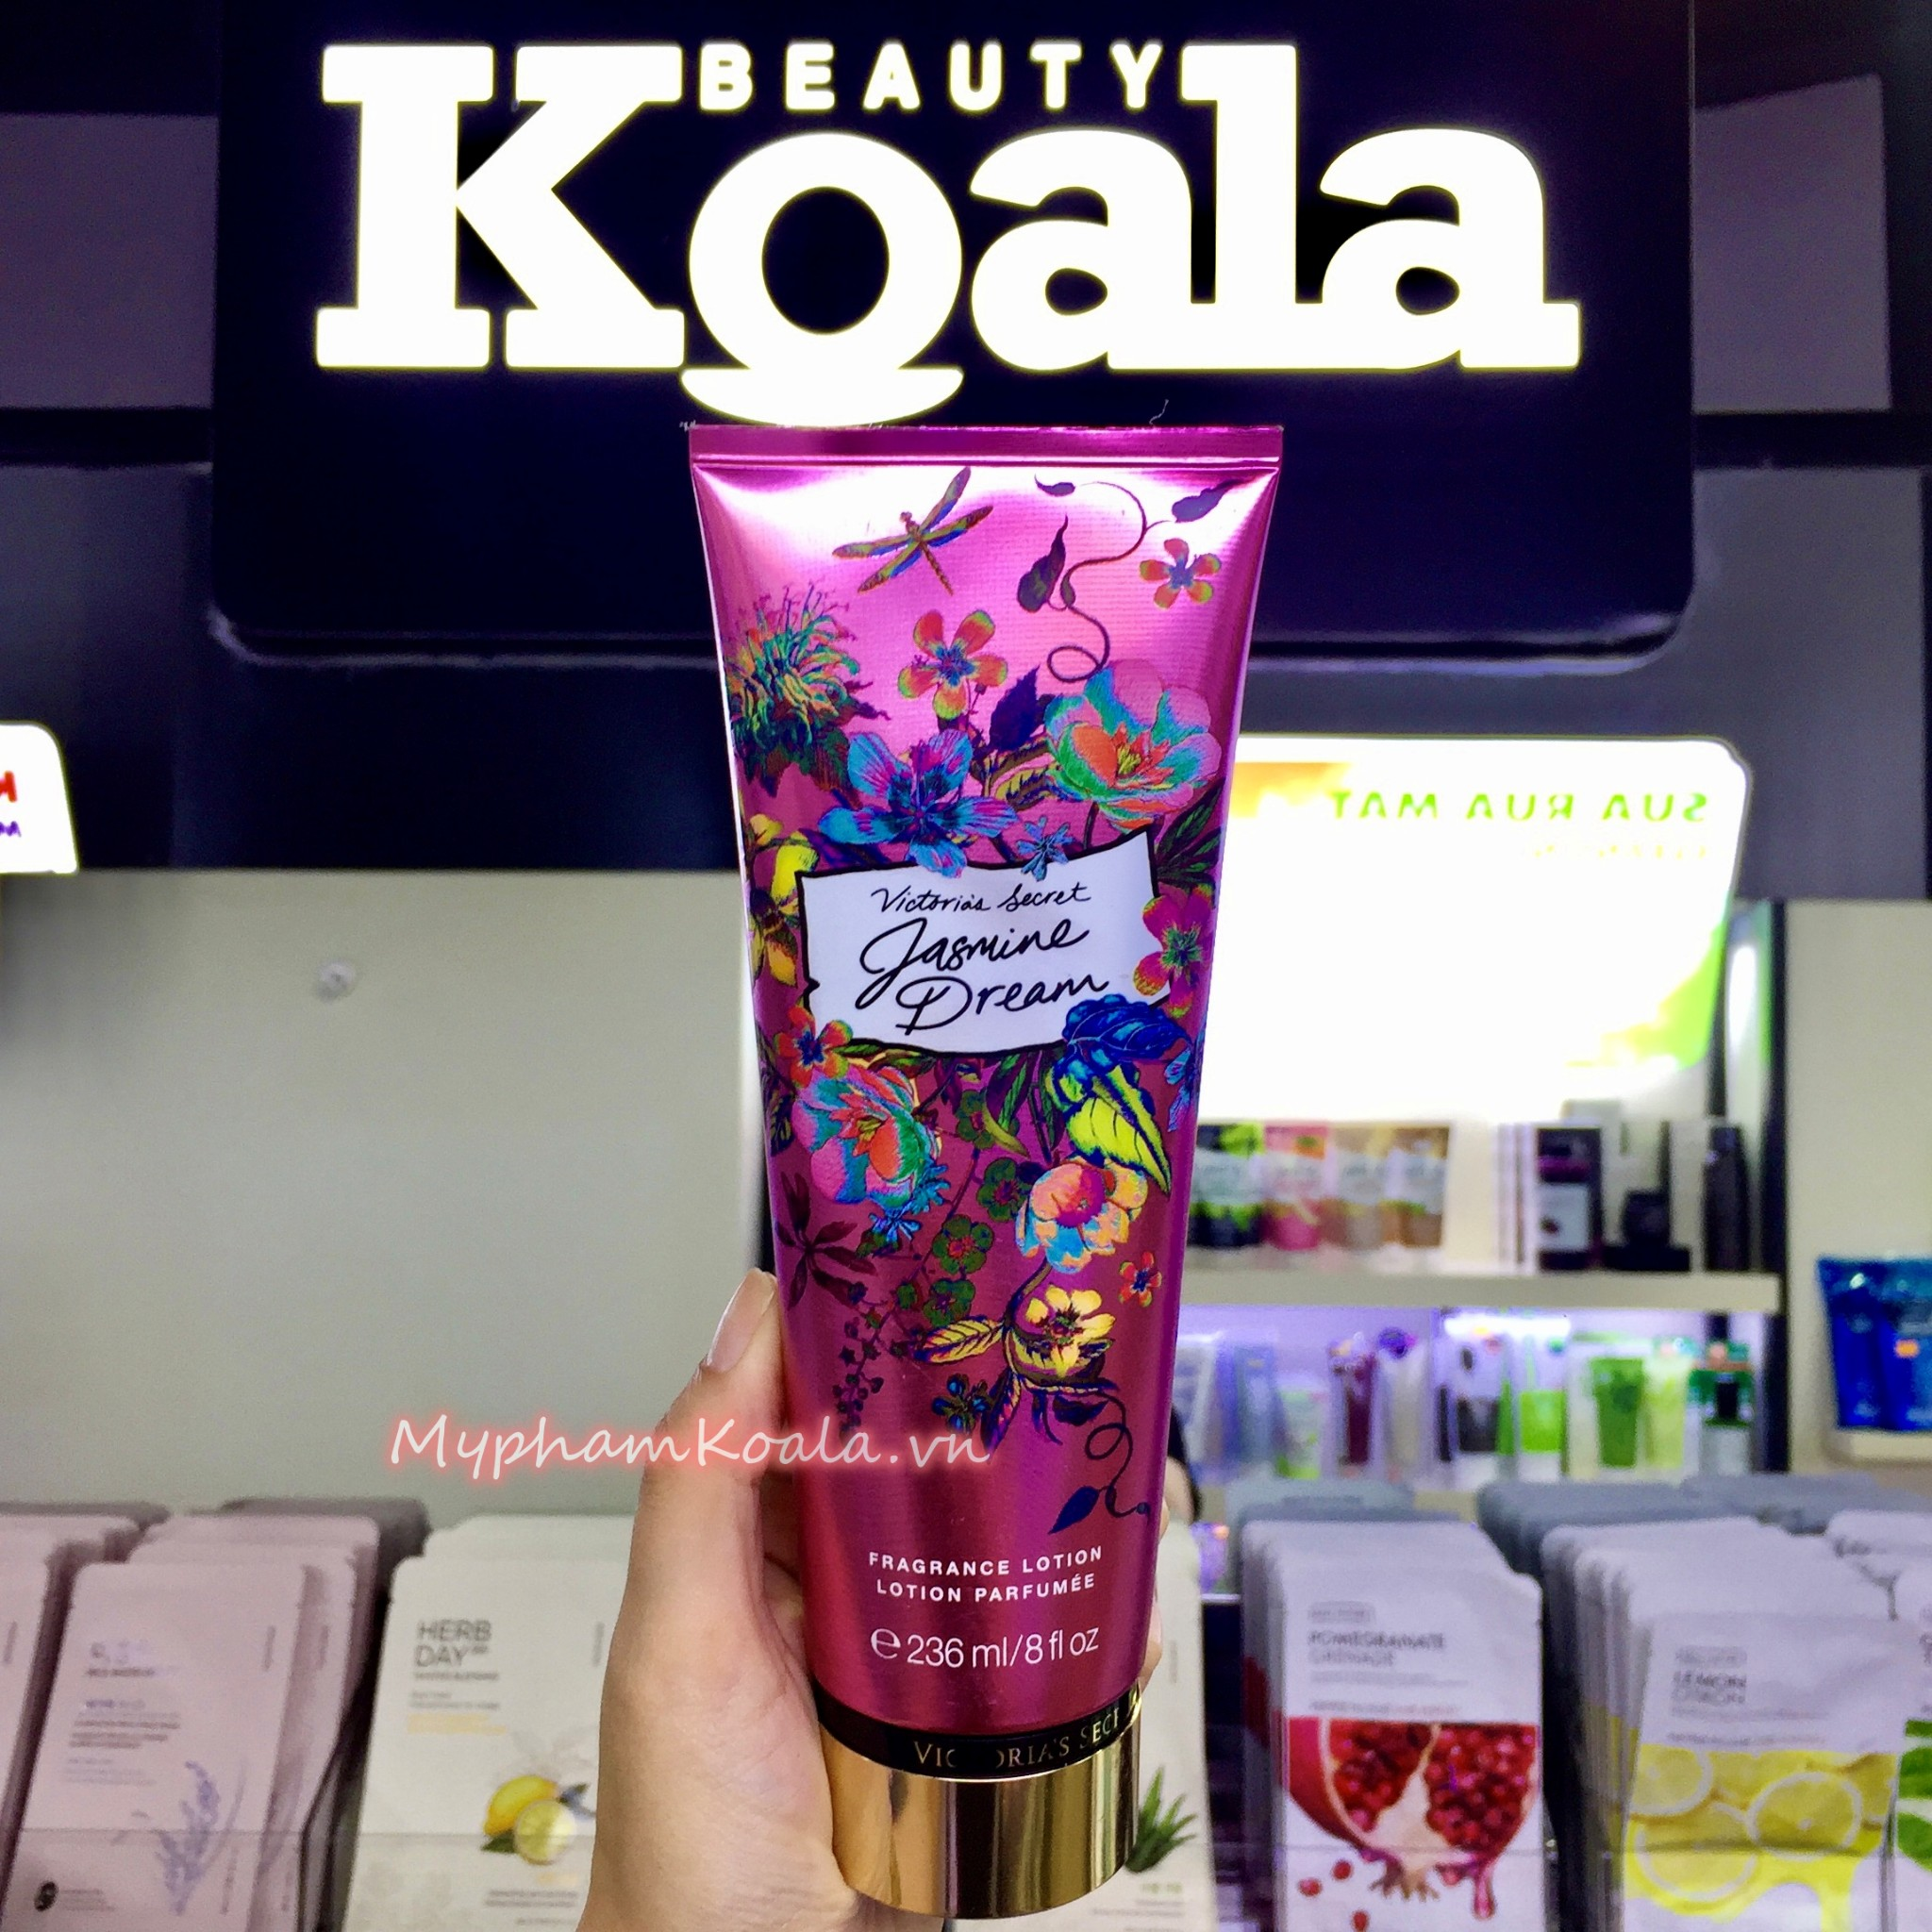 NEW ! Dưỡng Thể Nước Hoa Victoria's Secret WONDER GARDEN Fragrance Lotion 236ml